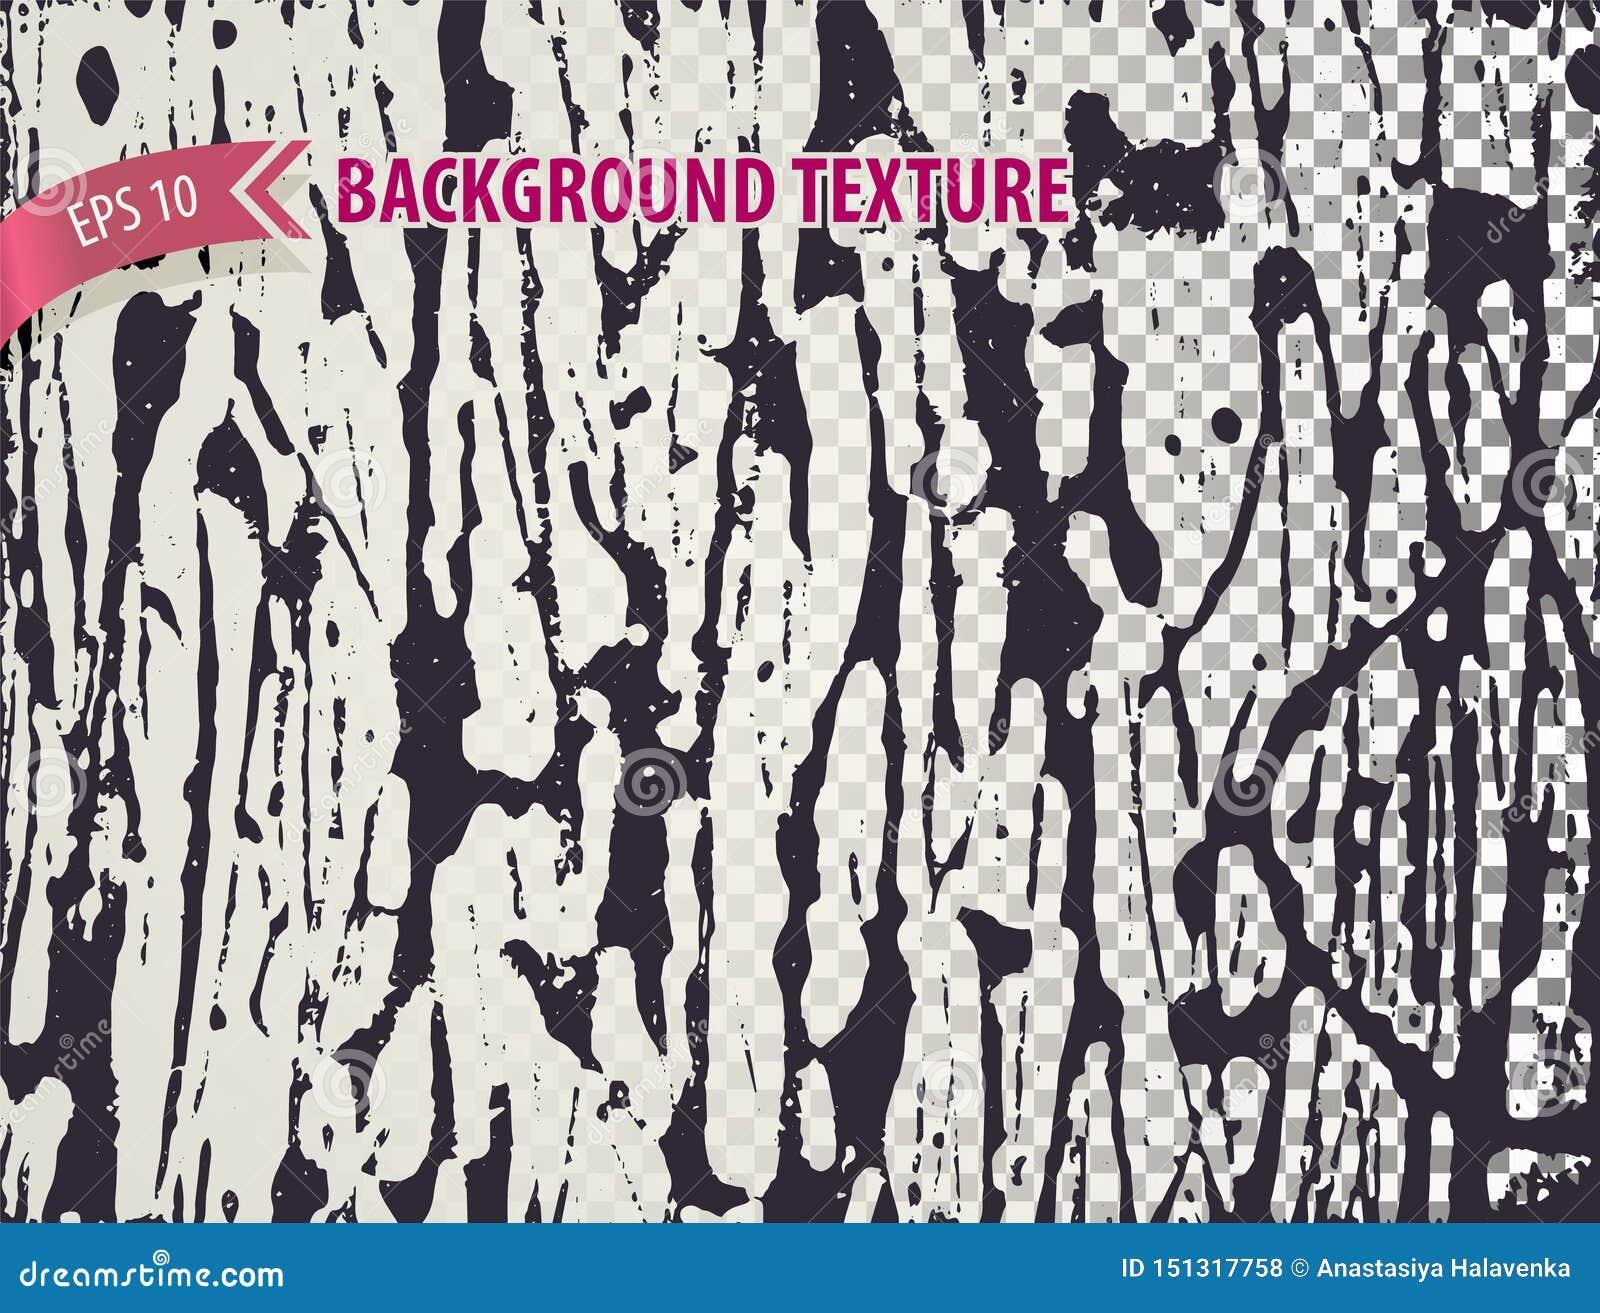 Grunge Overlay Texture For Site Web Design Banner Poster Vector Background Stock Vector Illustration Of Retro Design 151317758